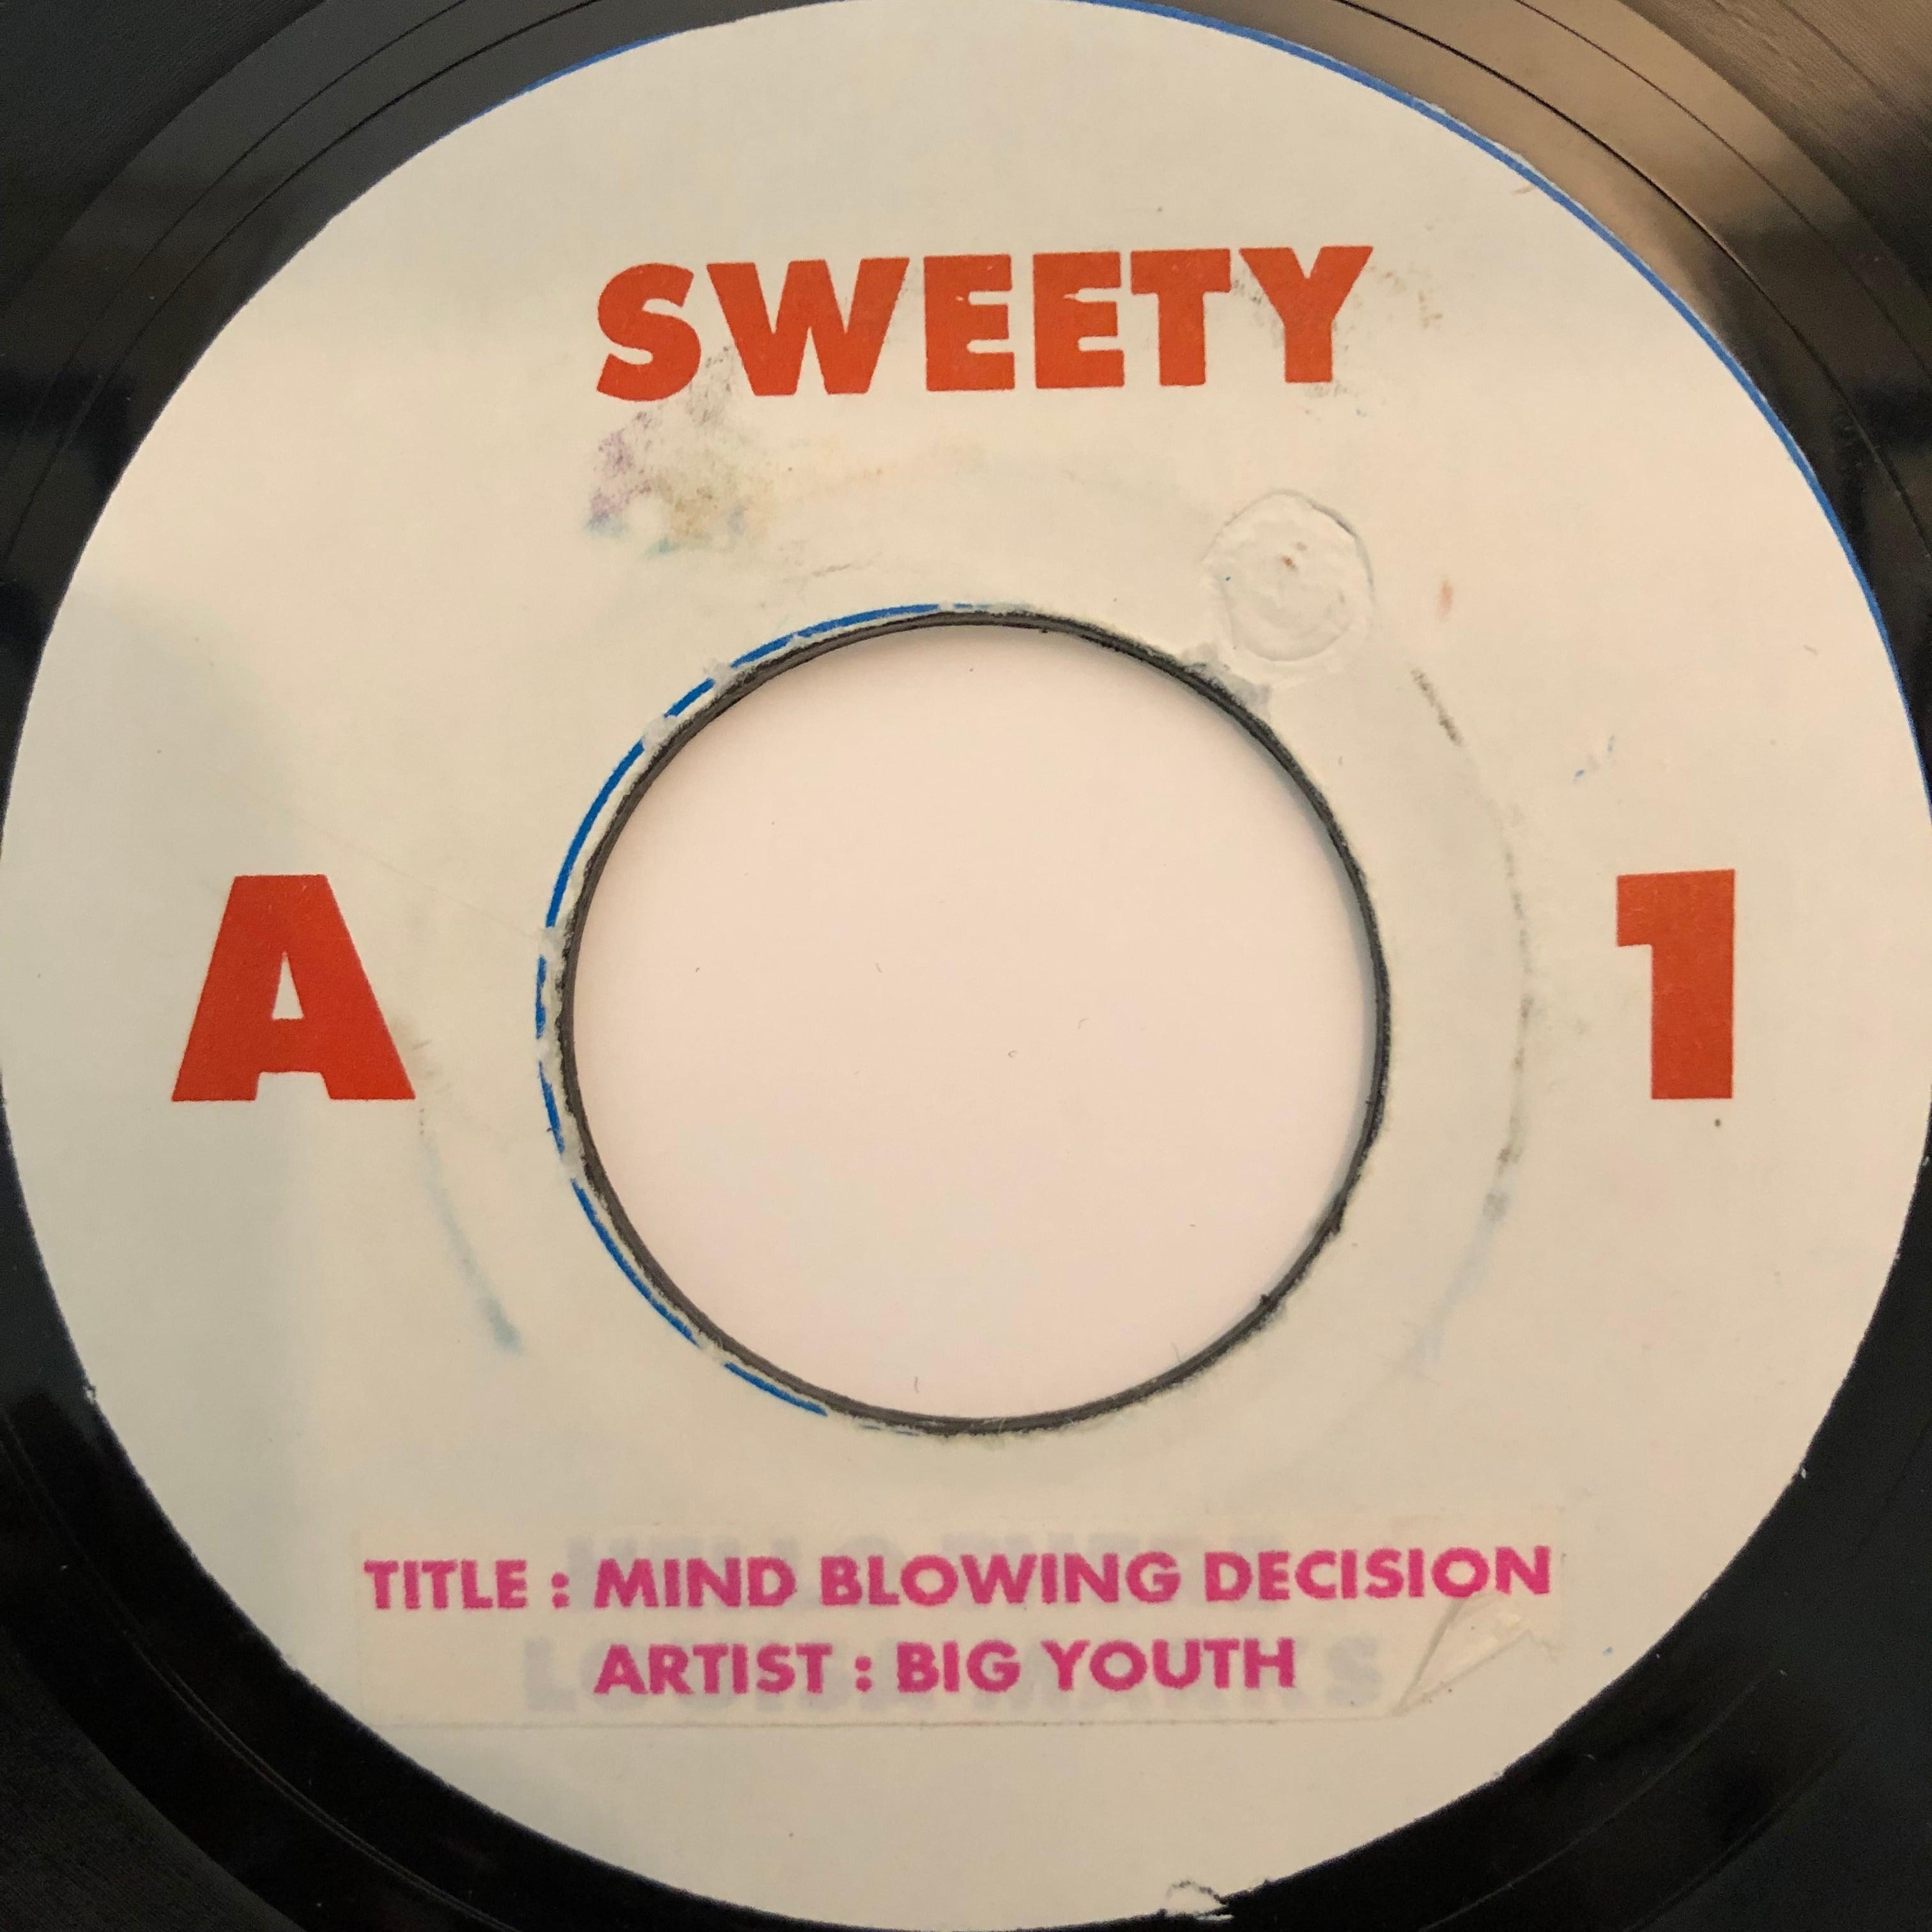 Big Youth(ビッグユース) - Mind Blowing Decision【7-20302】